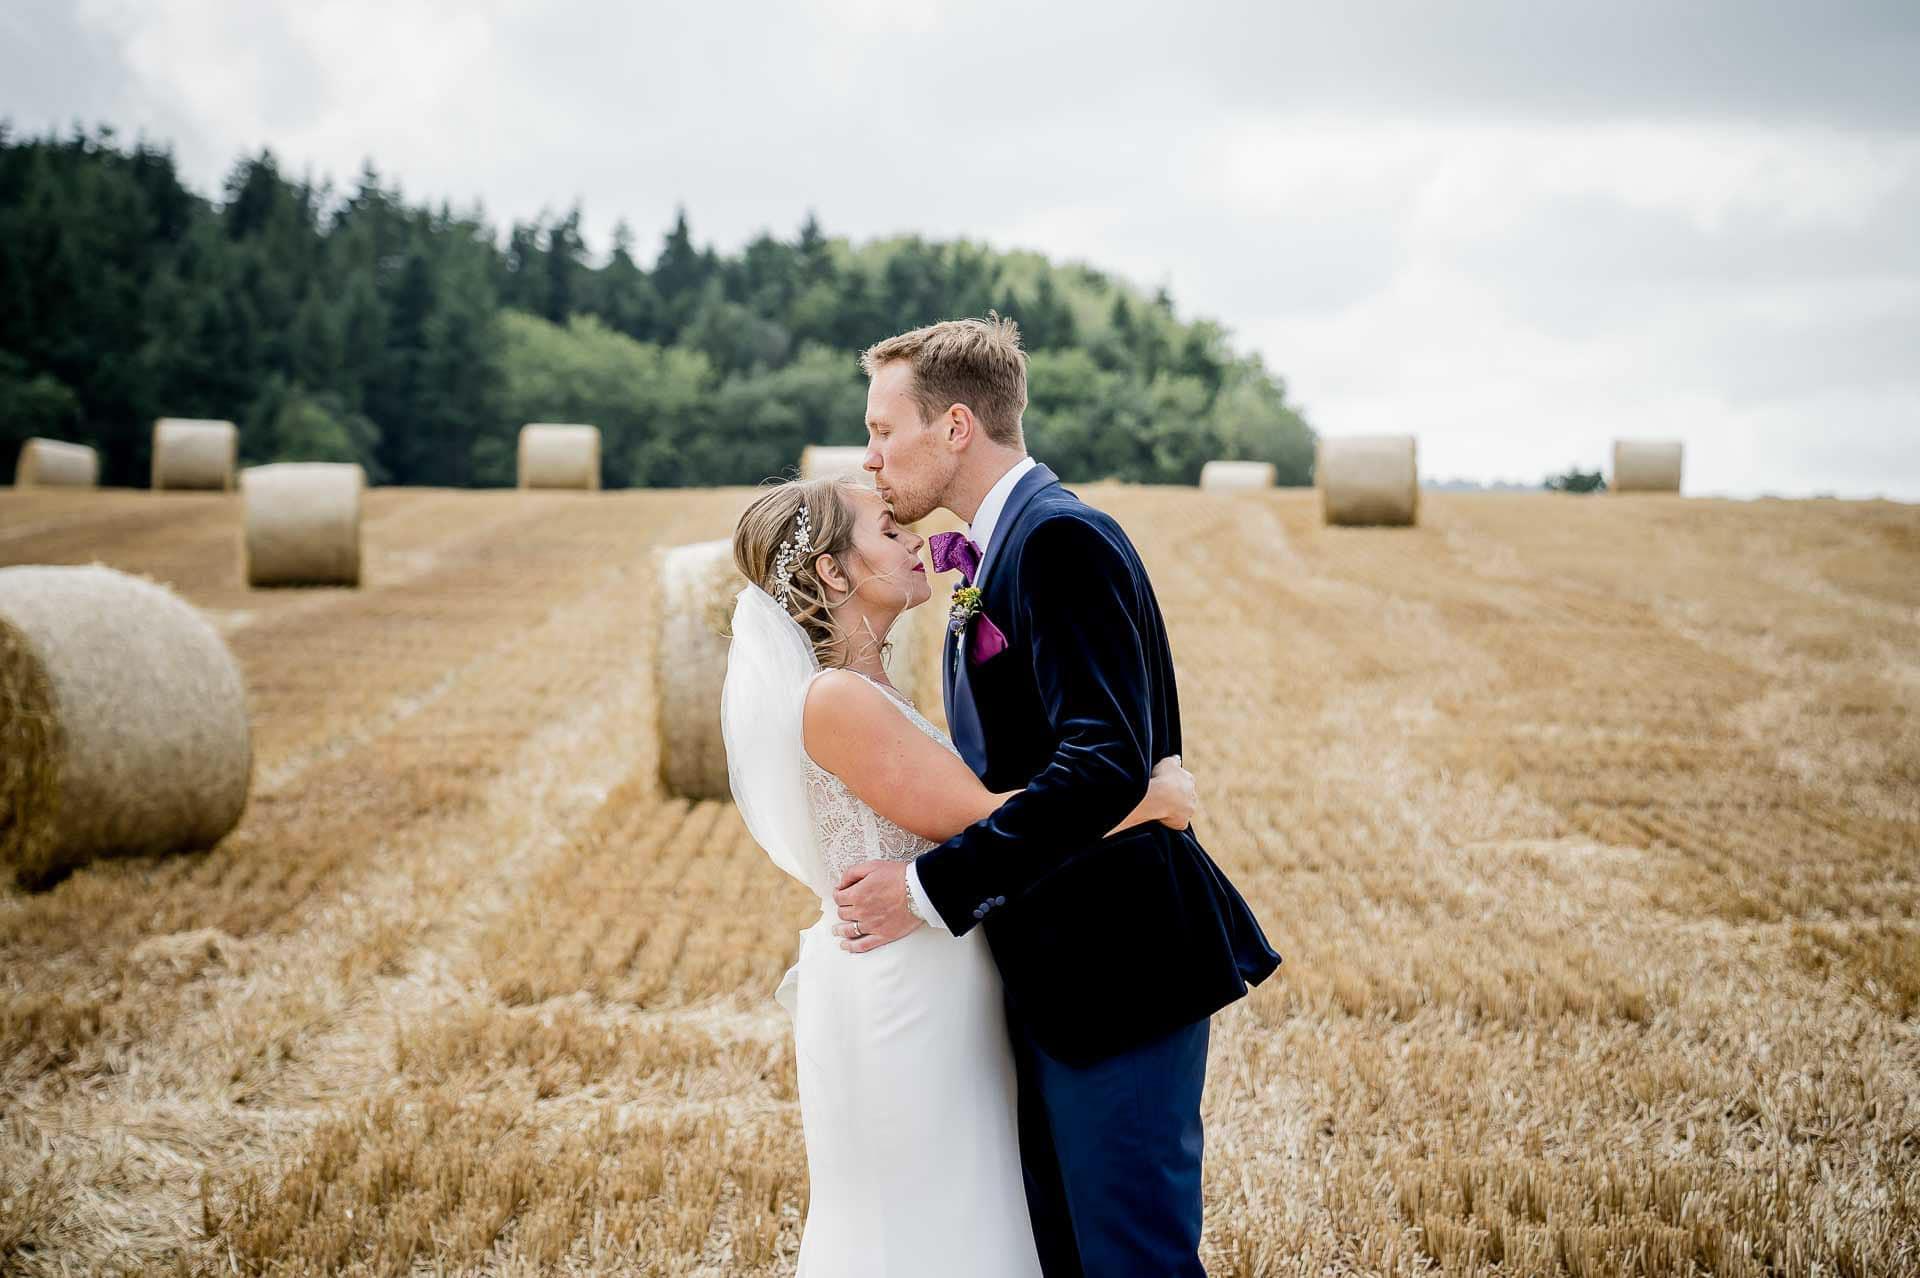 Huntlands Farm B&B Yurt Wedding | Amy + Chris